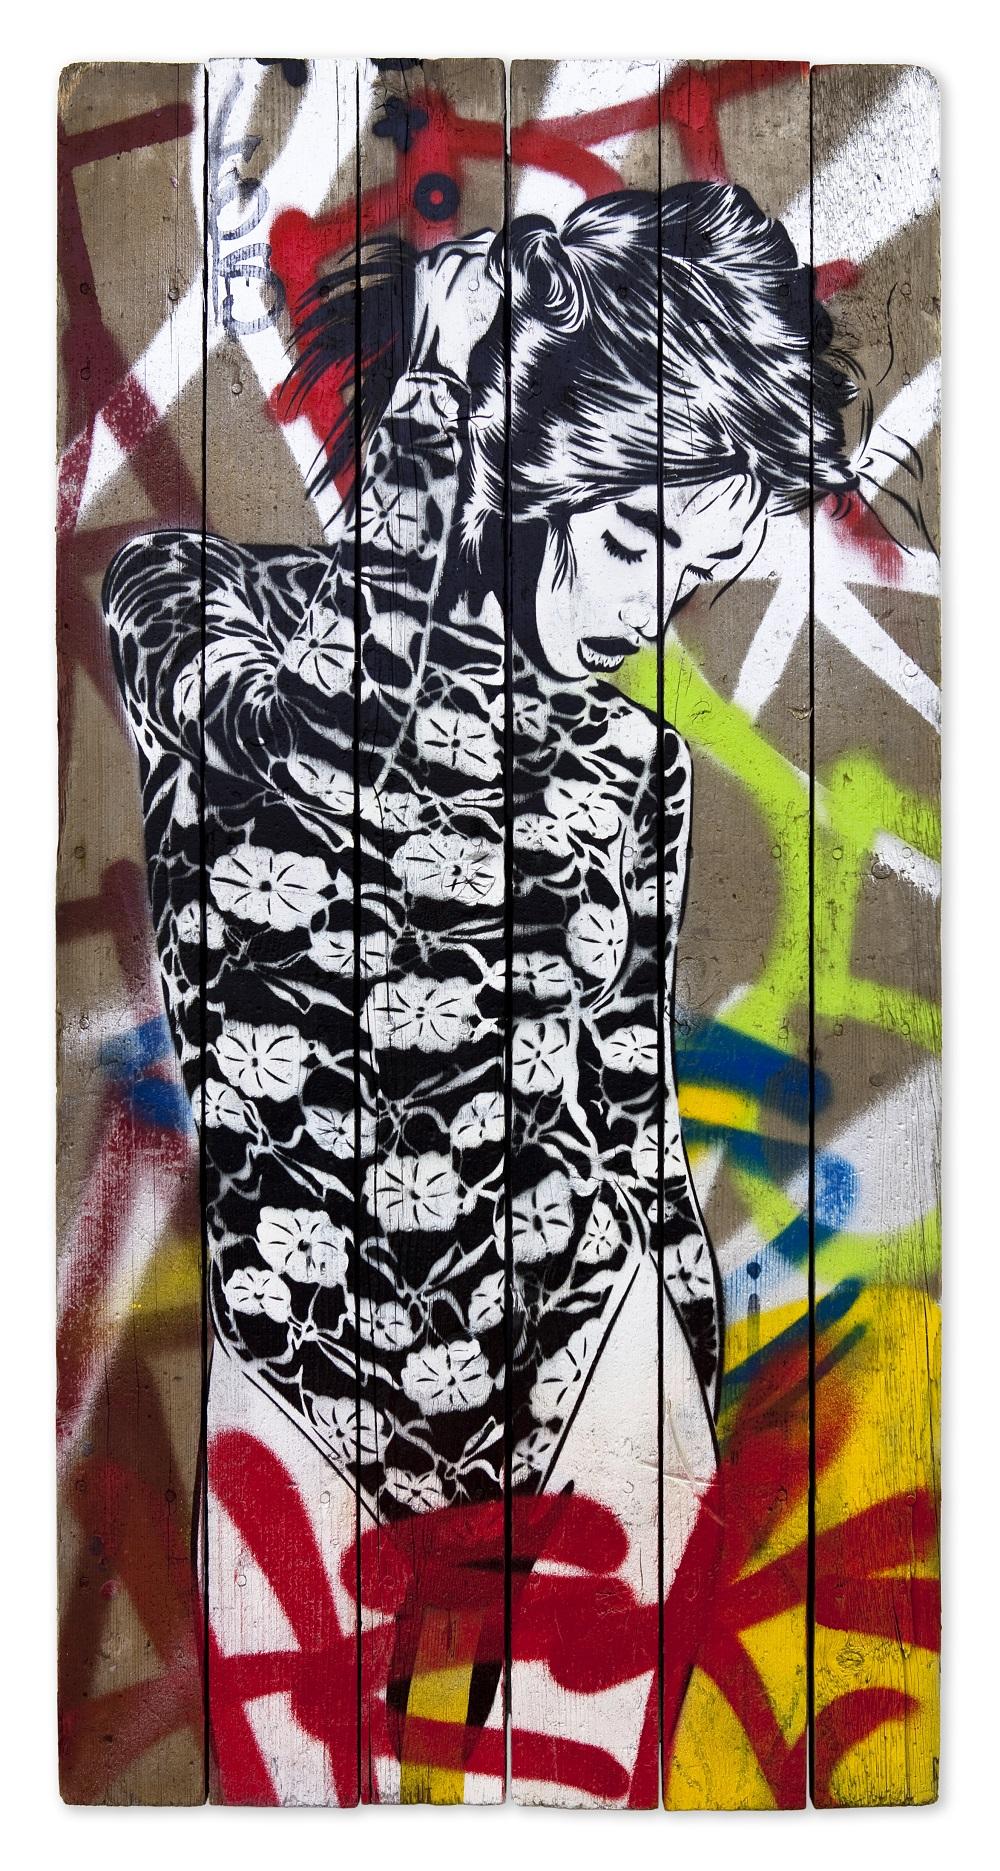 XOOOOX - Filo (Heks), 2017, 116 x 59 cm, Sprühfarbe auf Holz